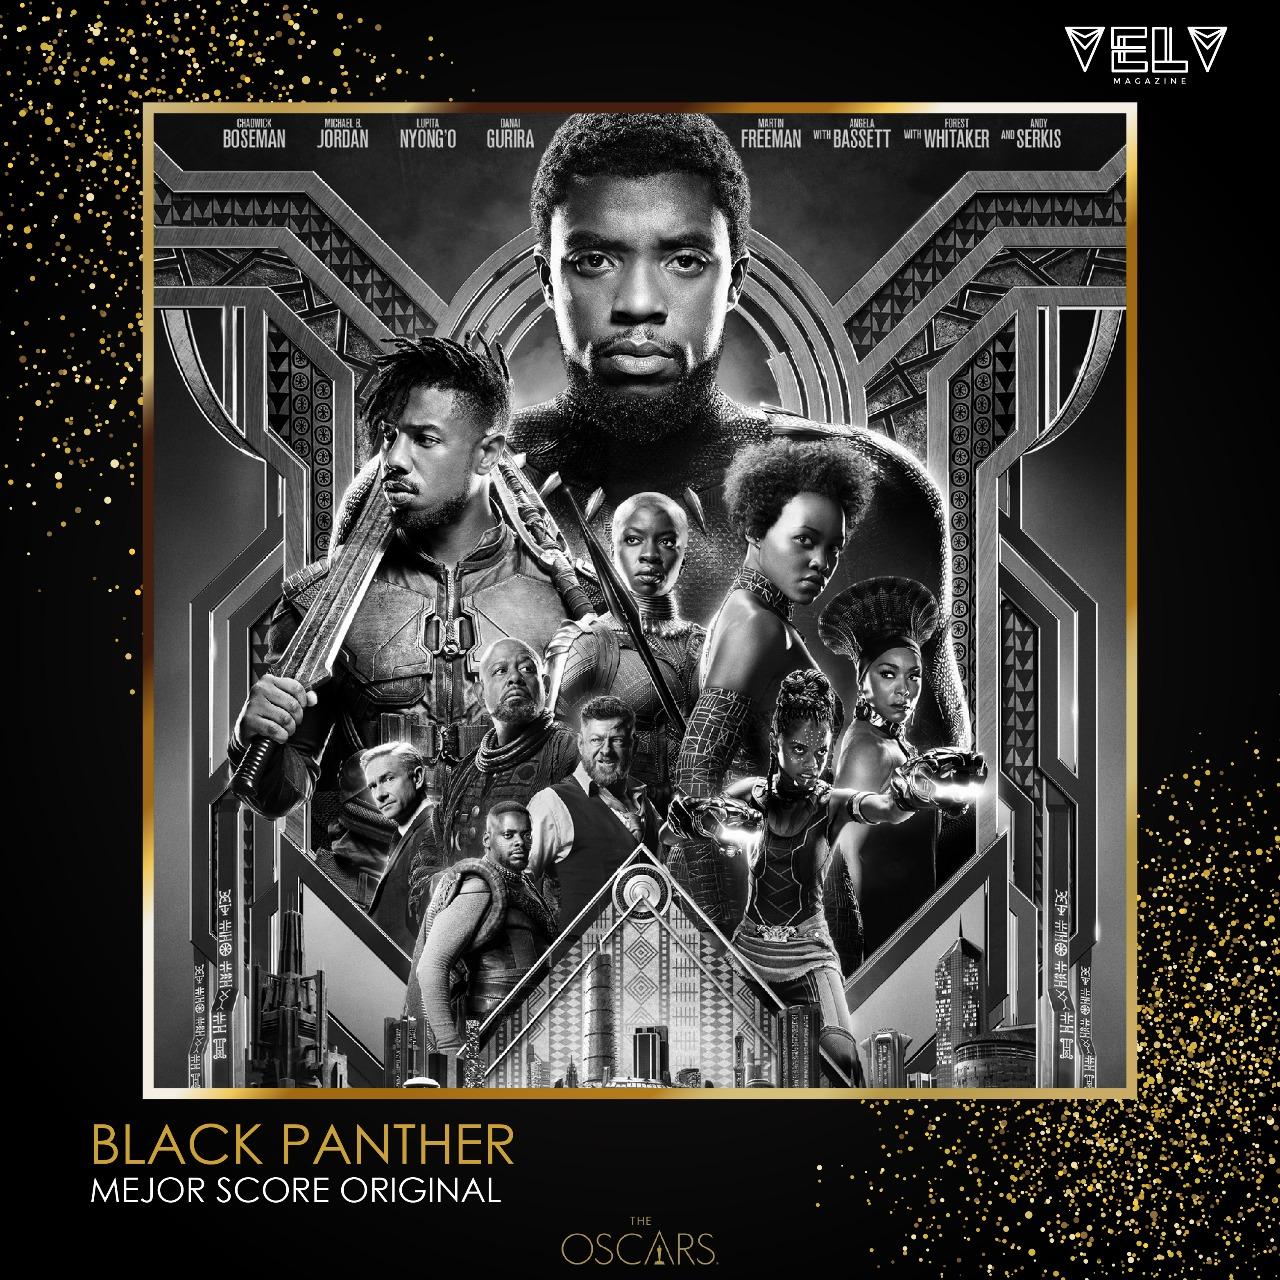 - Black PantherBlacKkLlansmanIf Beale Street Could TalkIsle of DogsMary Poppins Returns